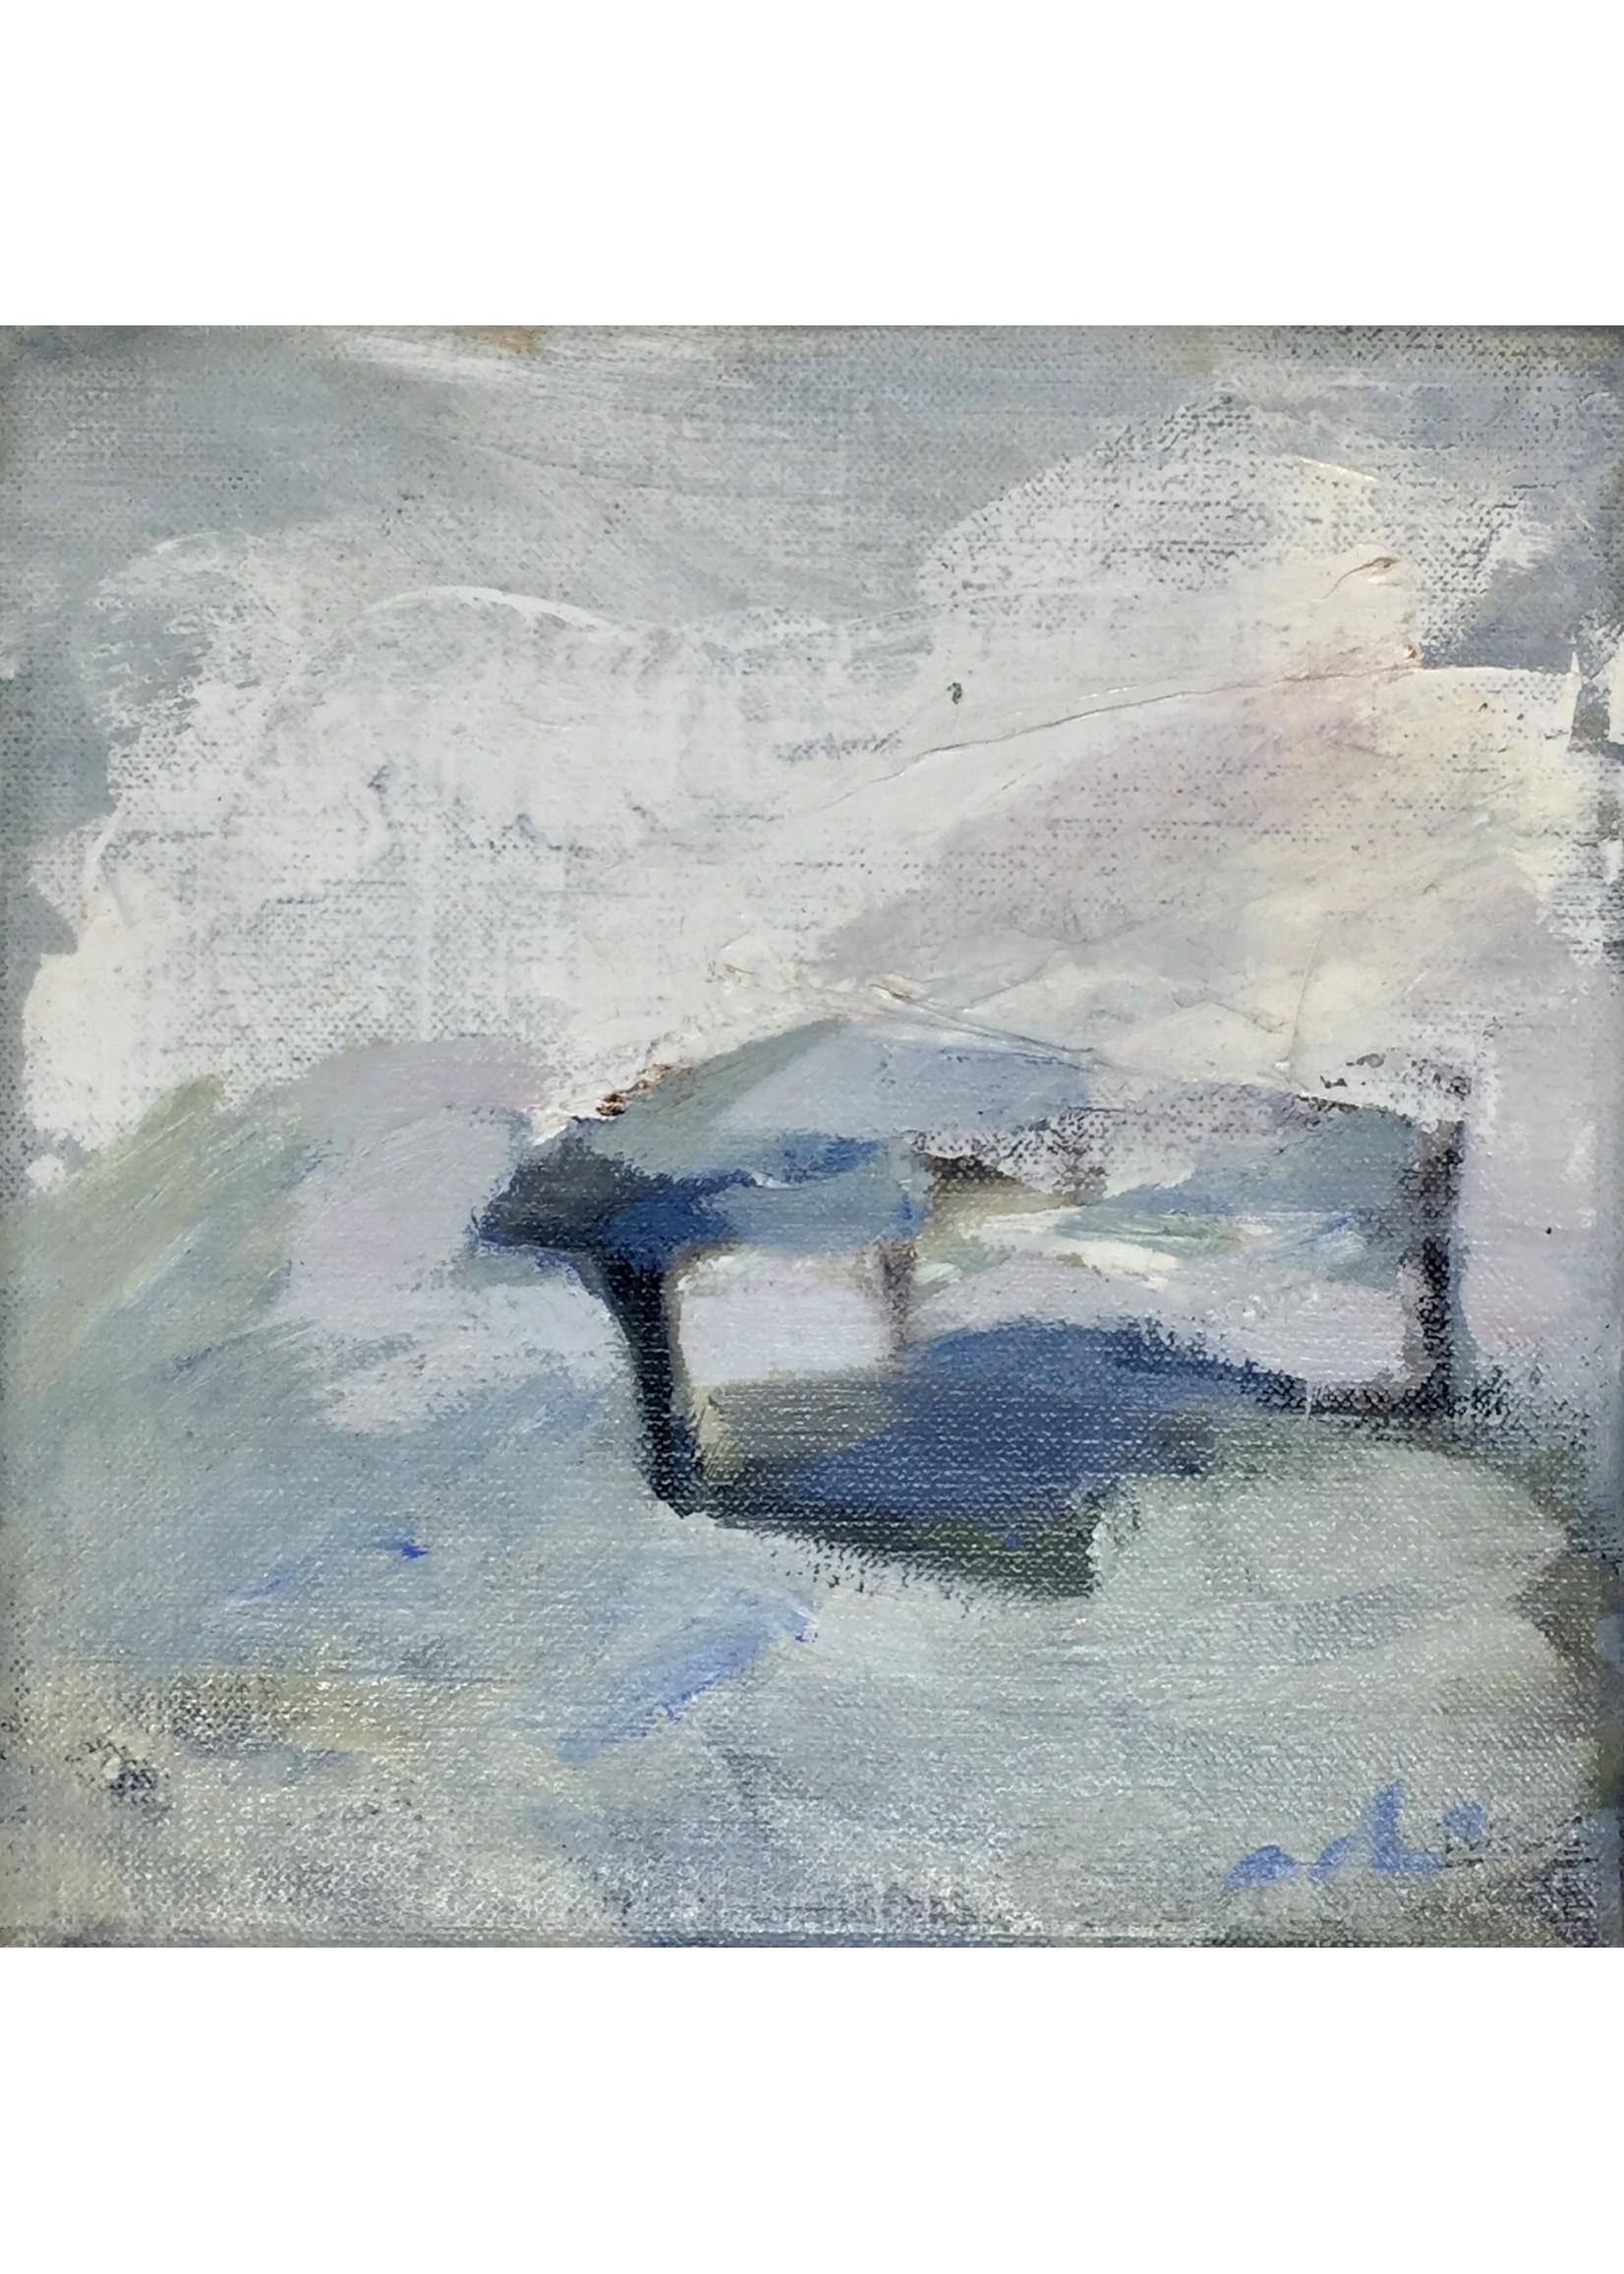 'Flügel' - Adri Frigge (Öl auf Leinwand)